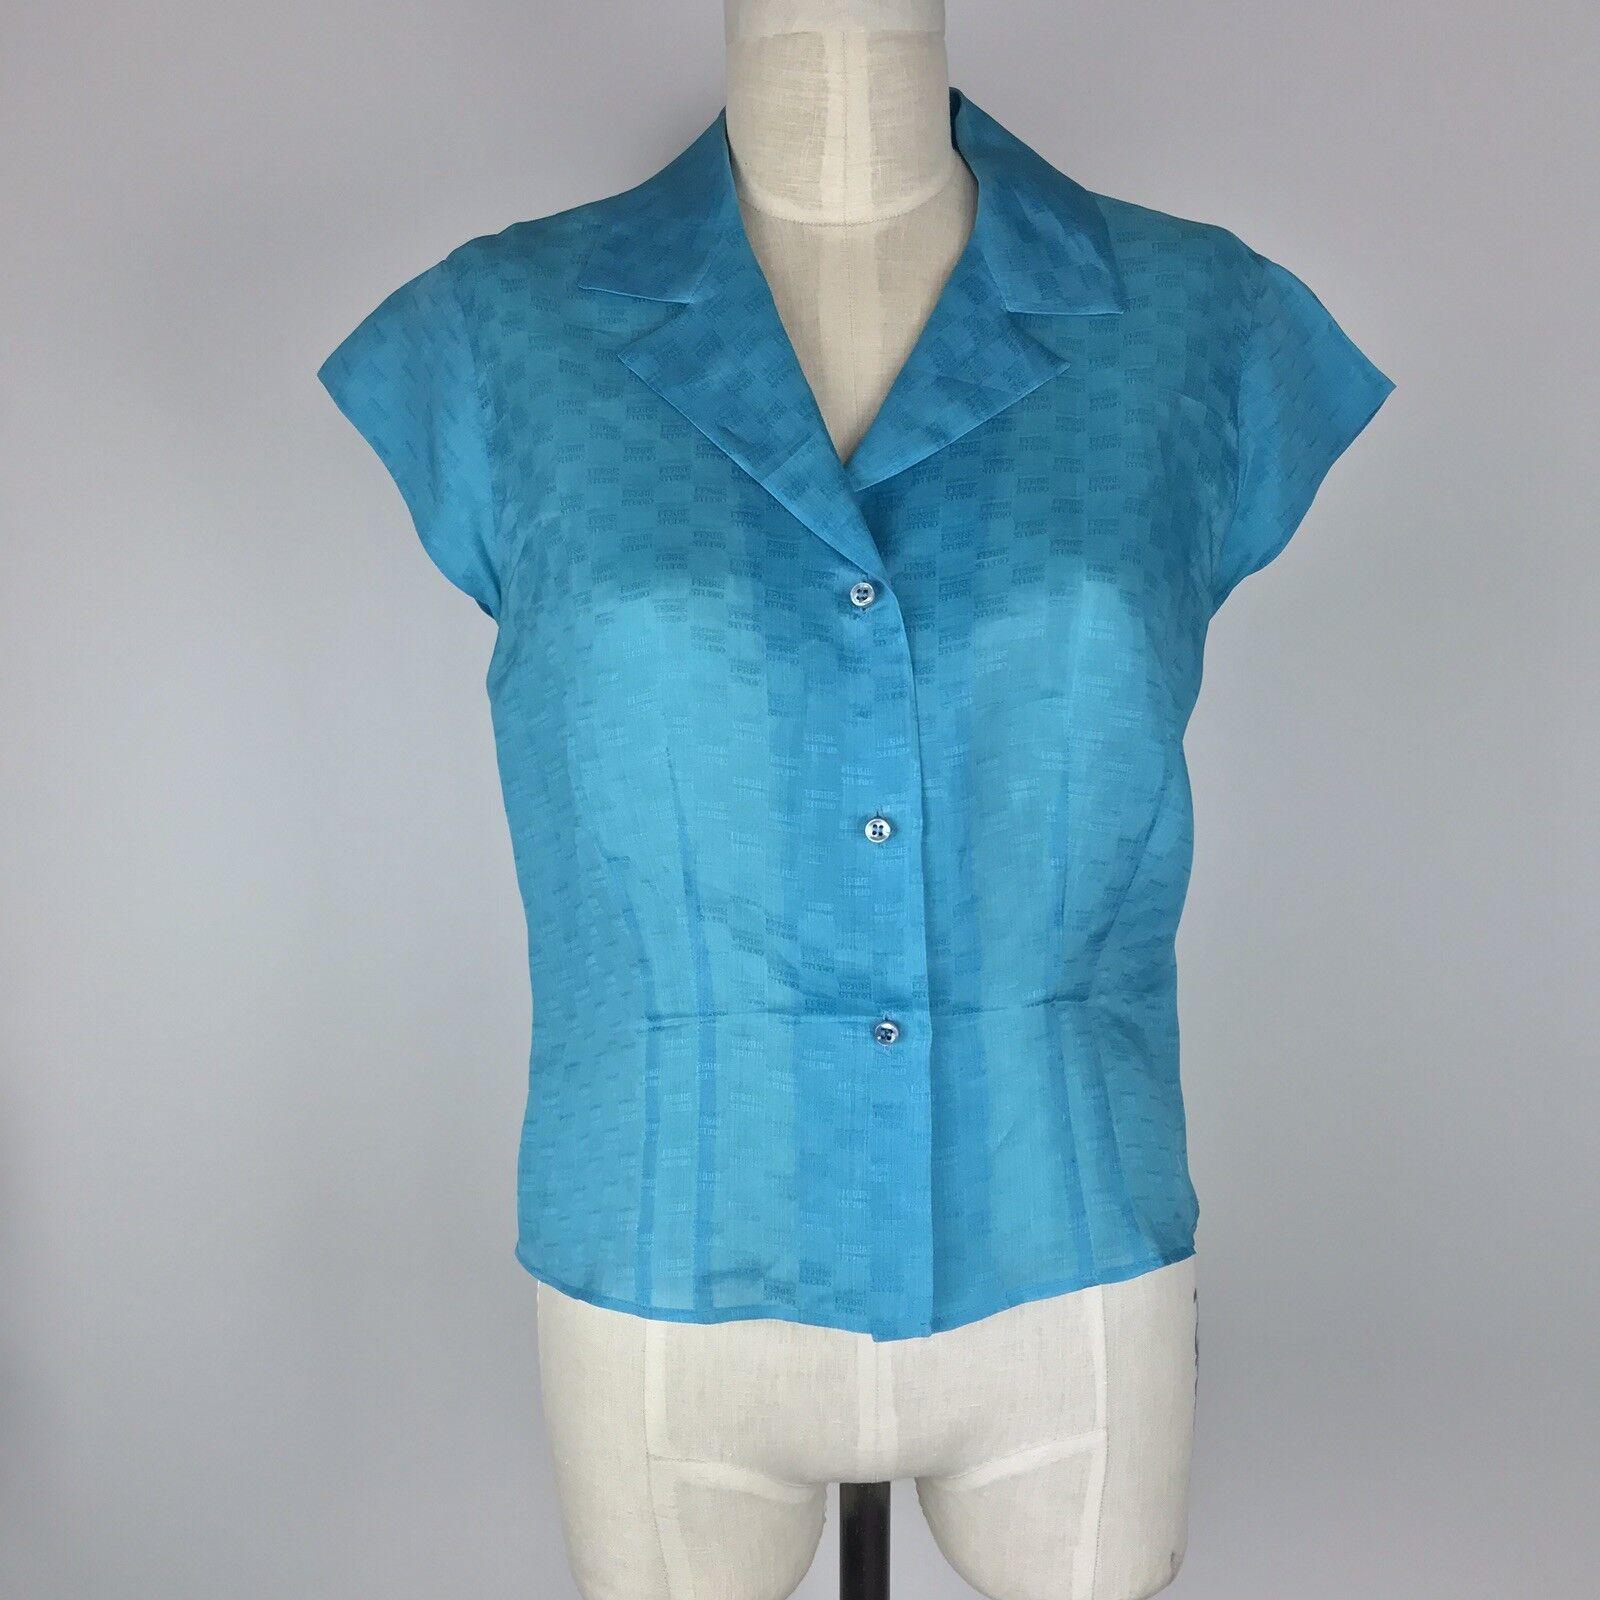 Gianfranco Ferre Studio Silk Taffeta Semi Sheer Blouse Size 8 bluee Short Sleeve